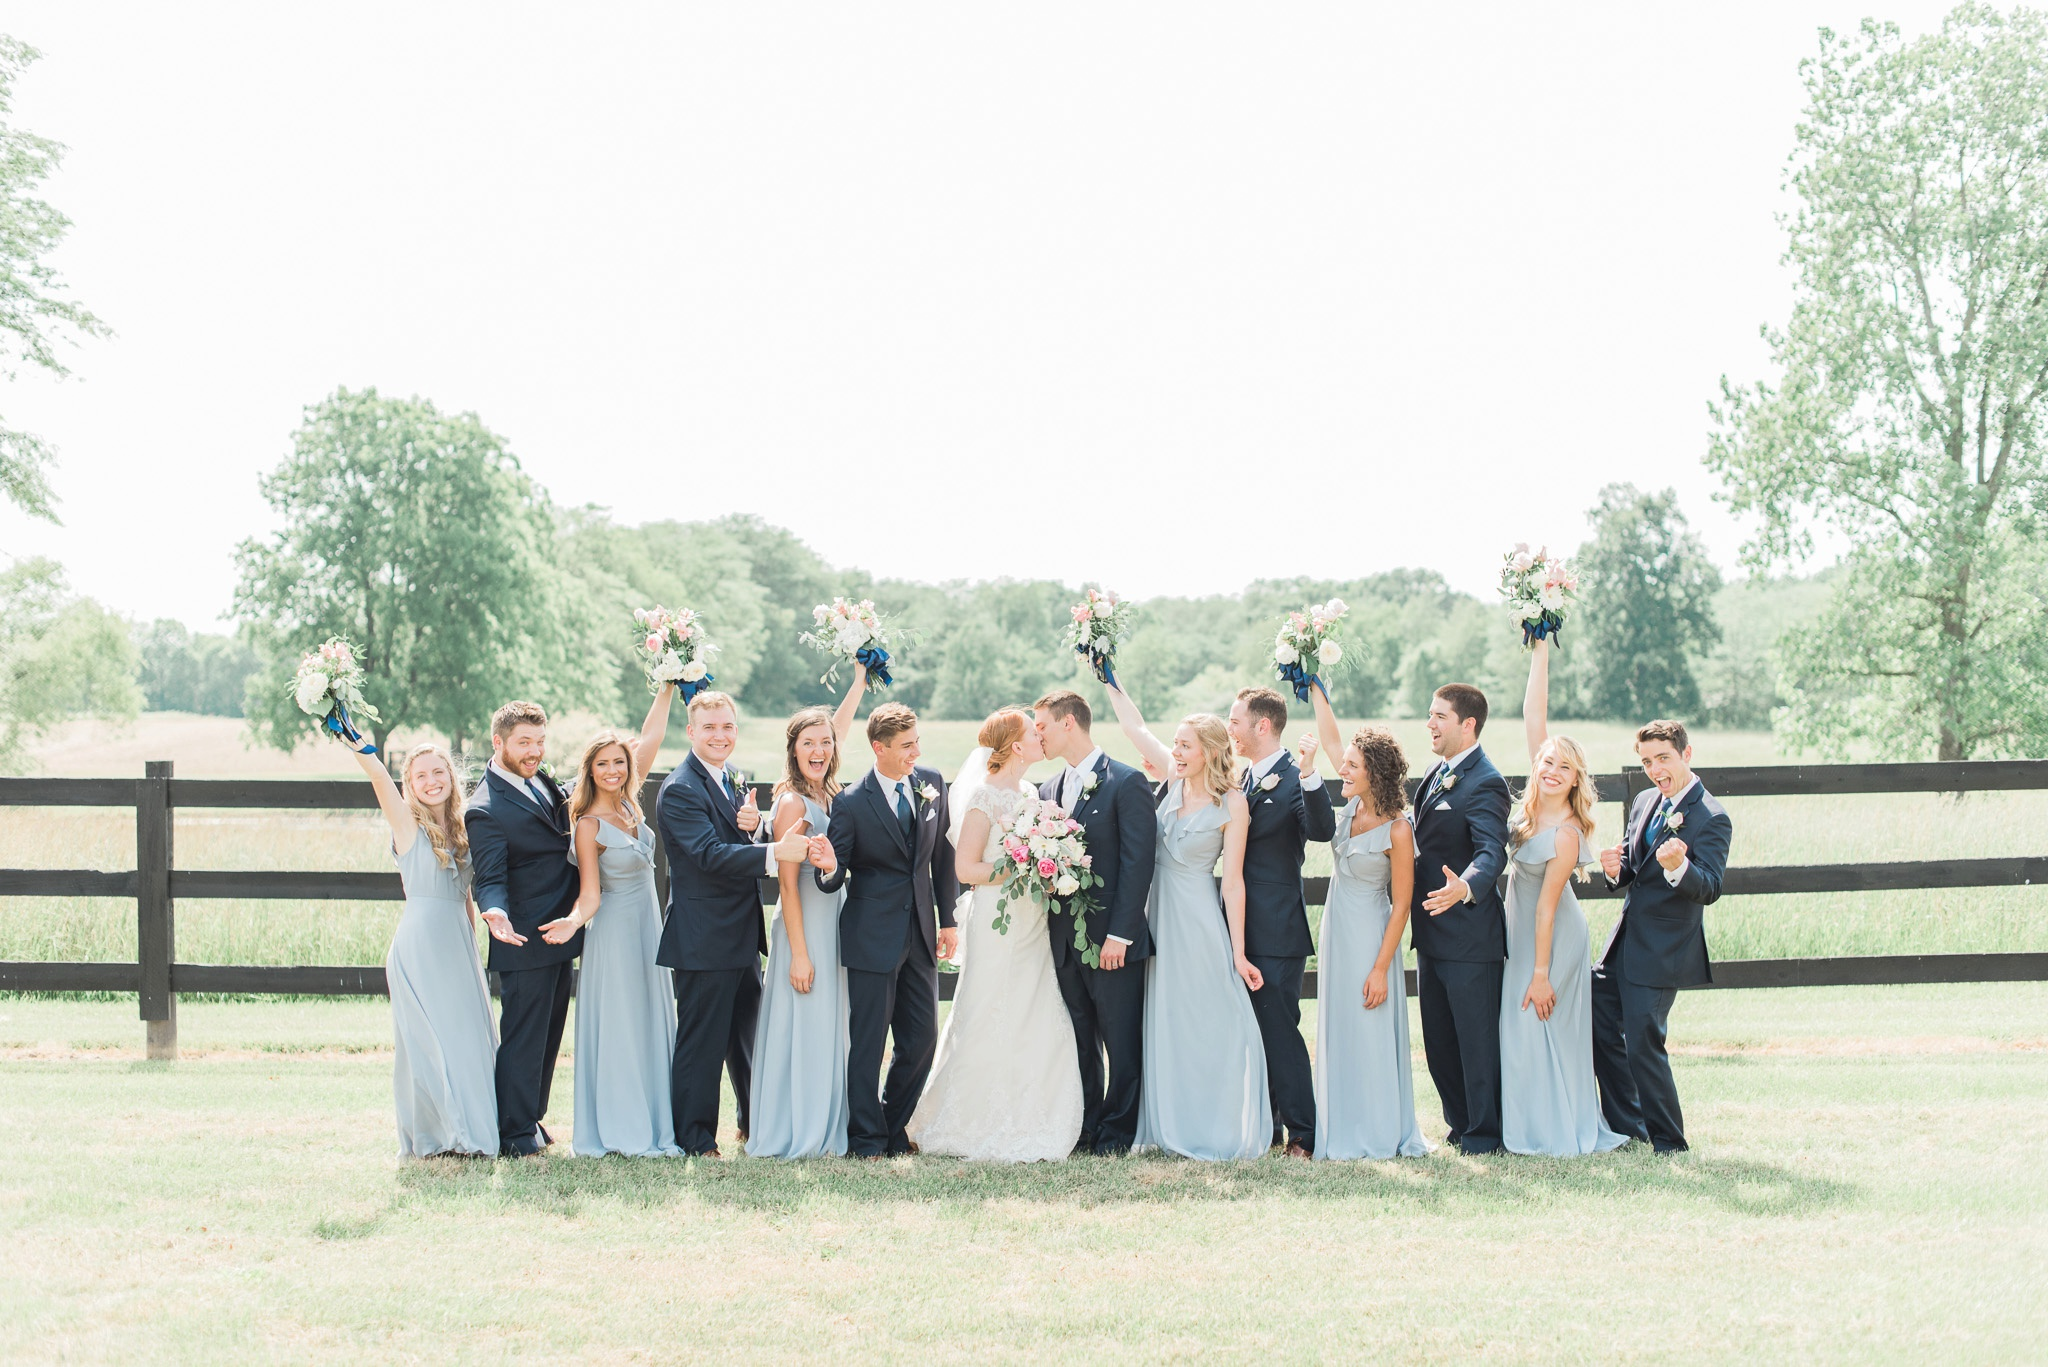 sunbury-ohio-wedding-hannah-johnathan_0066.jpg